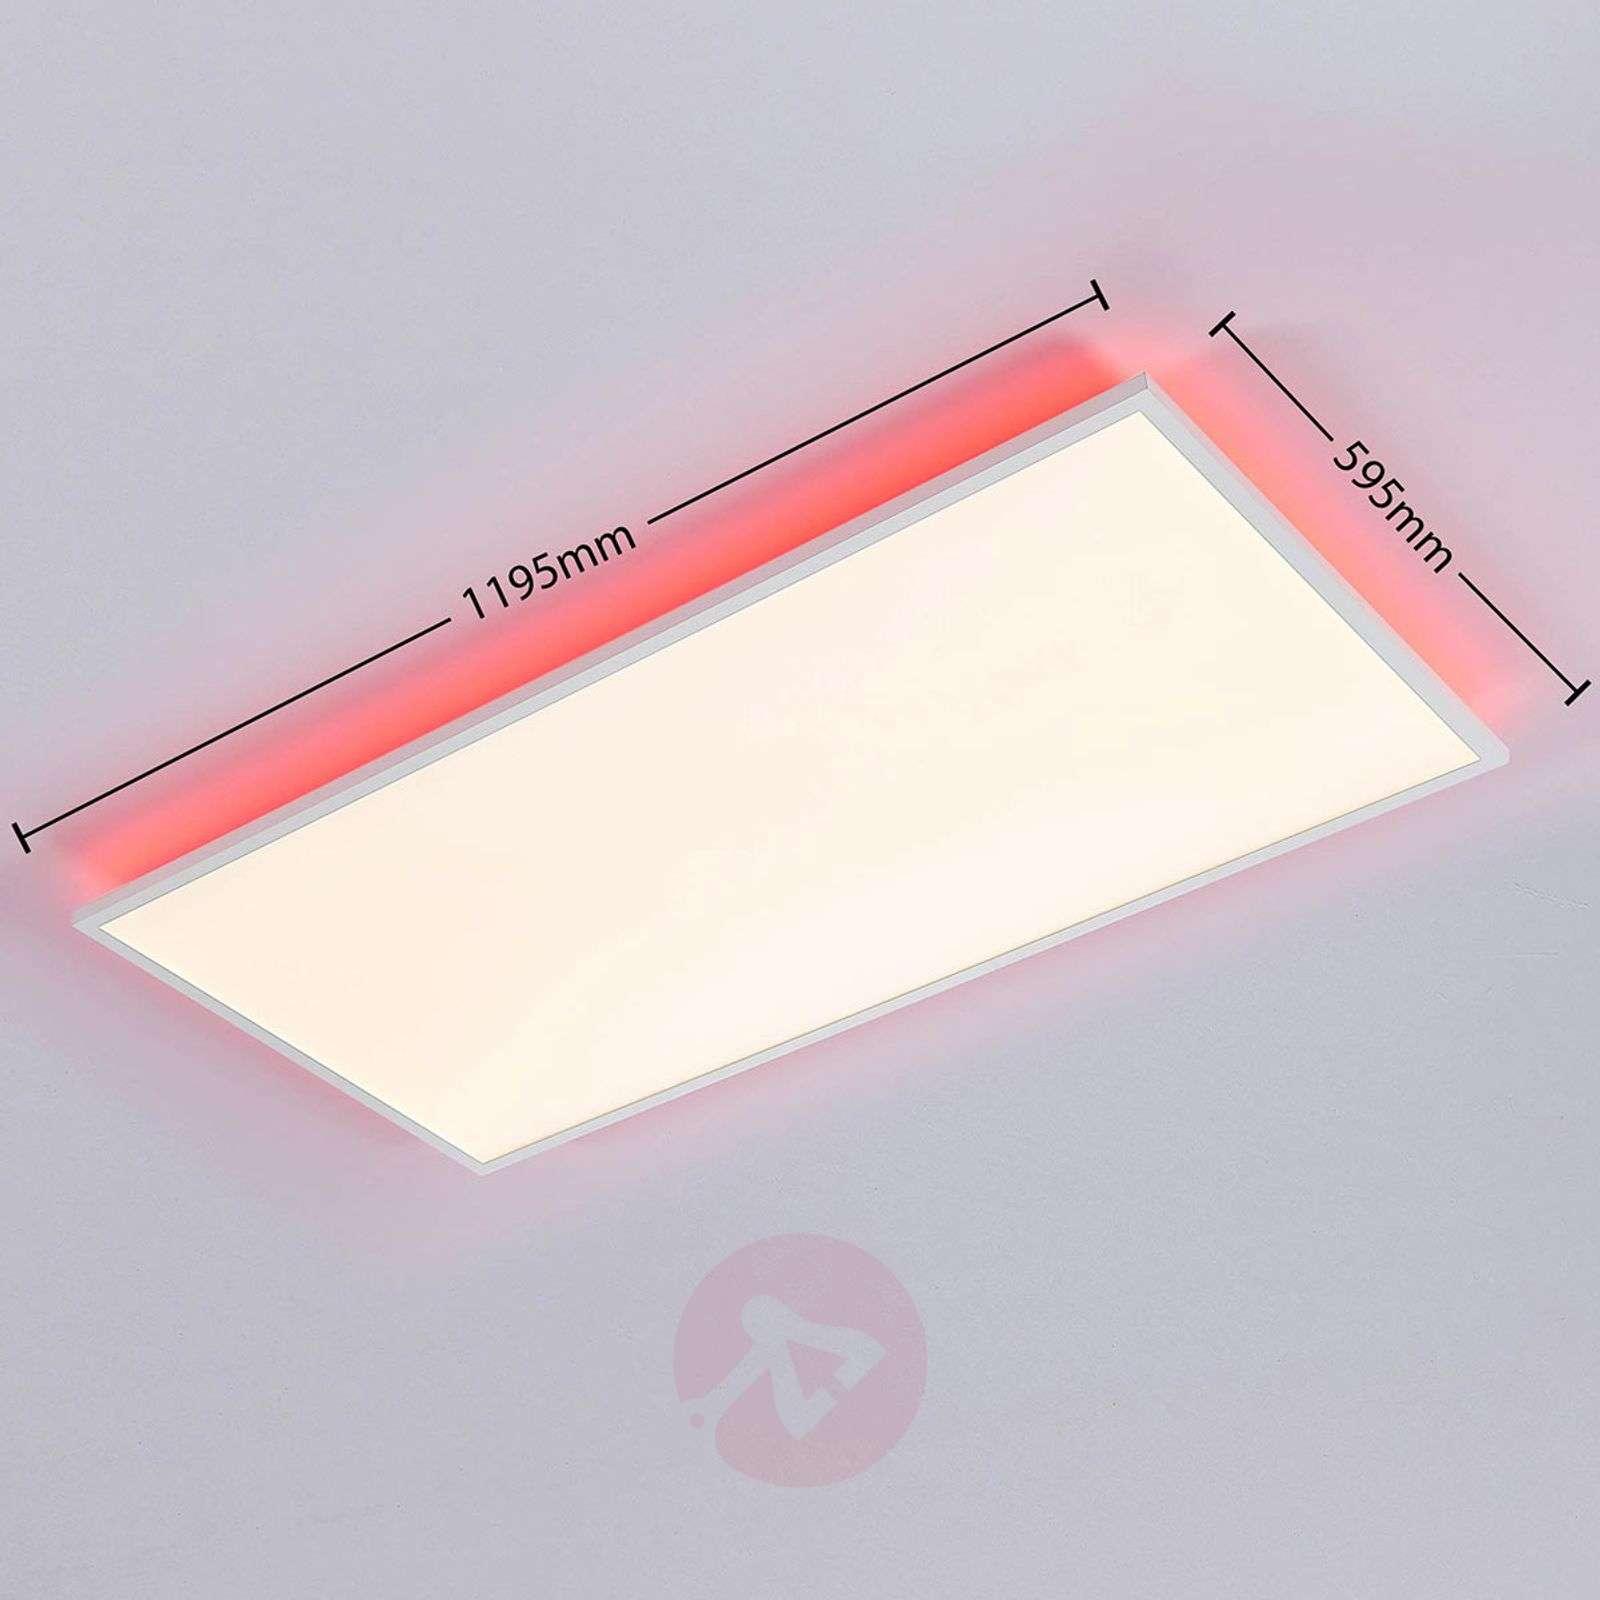 LED panel CCT Brenda, remote control,59.5x119.5cm-9624208-02